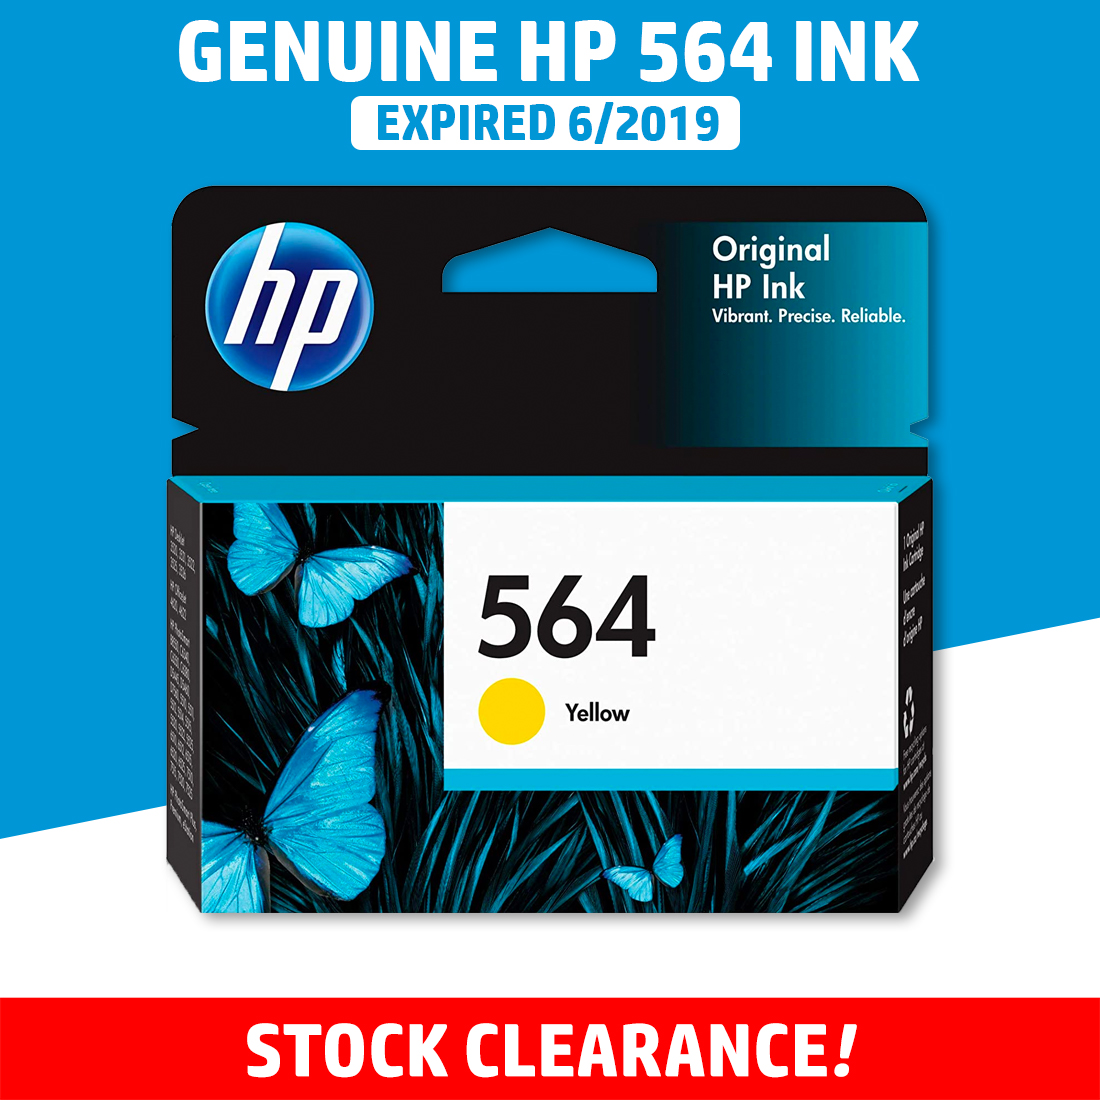 [CLEARANCE] Original HP 564 Color Ink Cartridge - Genuine HP Ink CB318WA CB319WA CB320WA Color Inks (300 Pages)